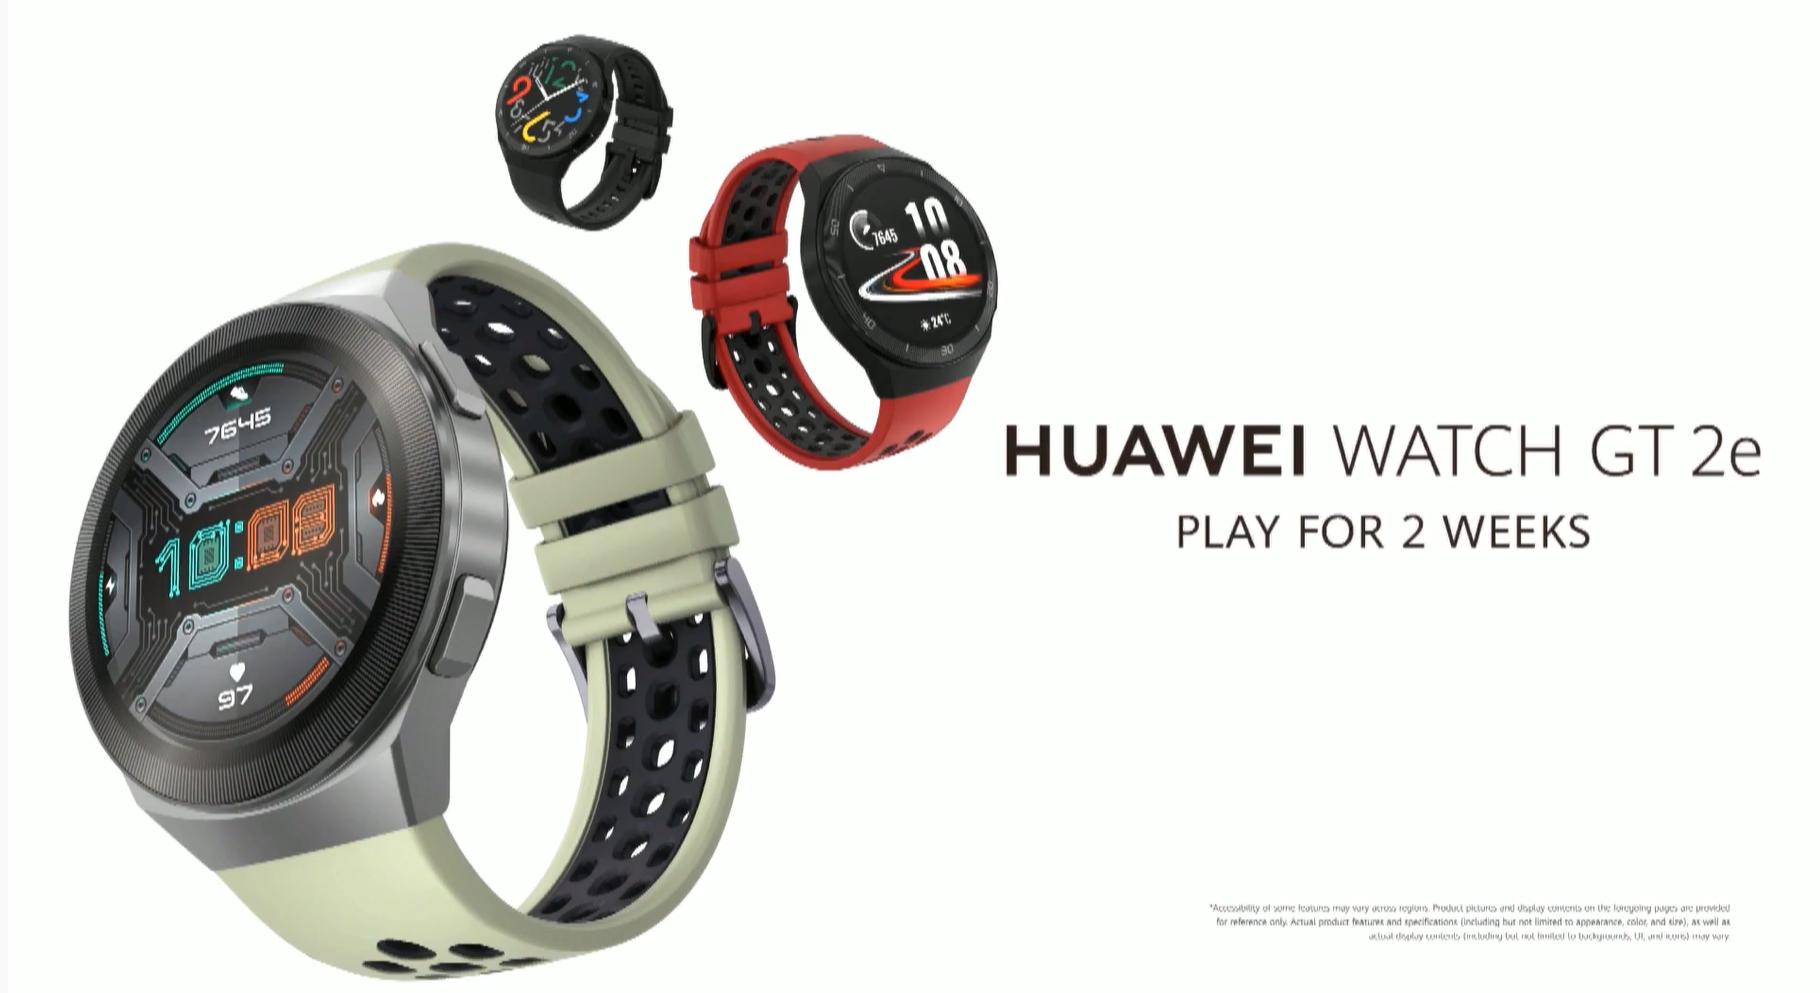 Fiatalokat célozza a Huawei Watch GT 2e